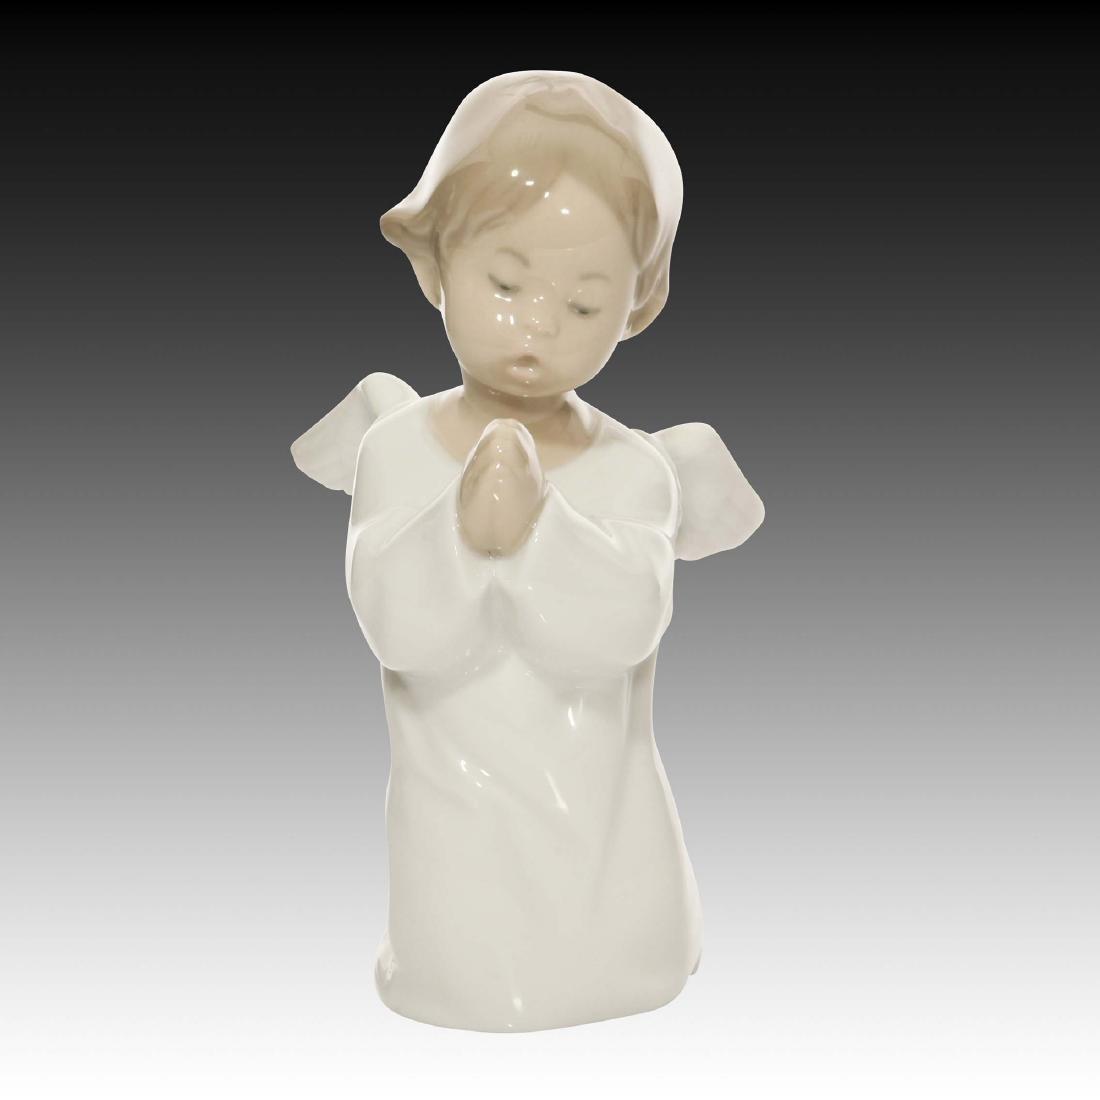 LLADRO ANGEL PRAYING FIGURINE 4538